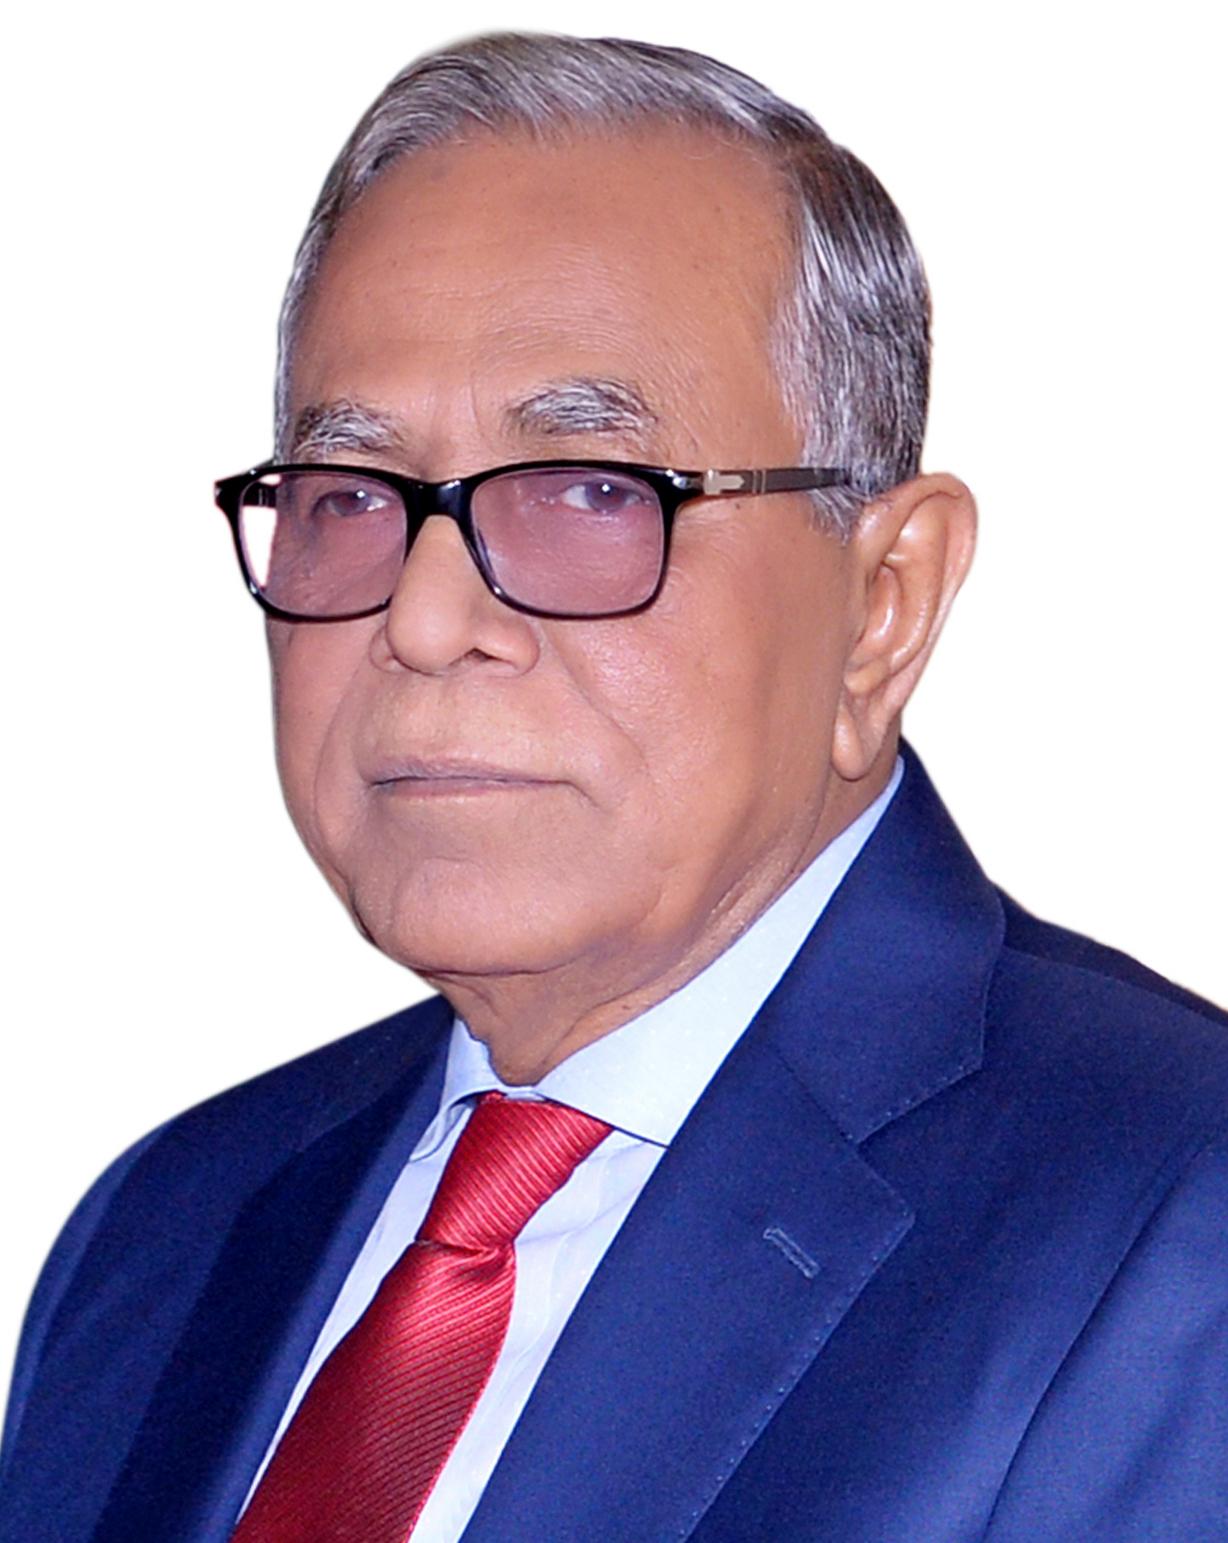 Md. Abdul Hamid Hon'ble President of Bangladesh